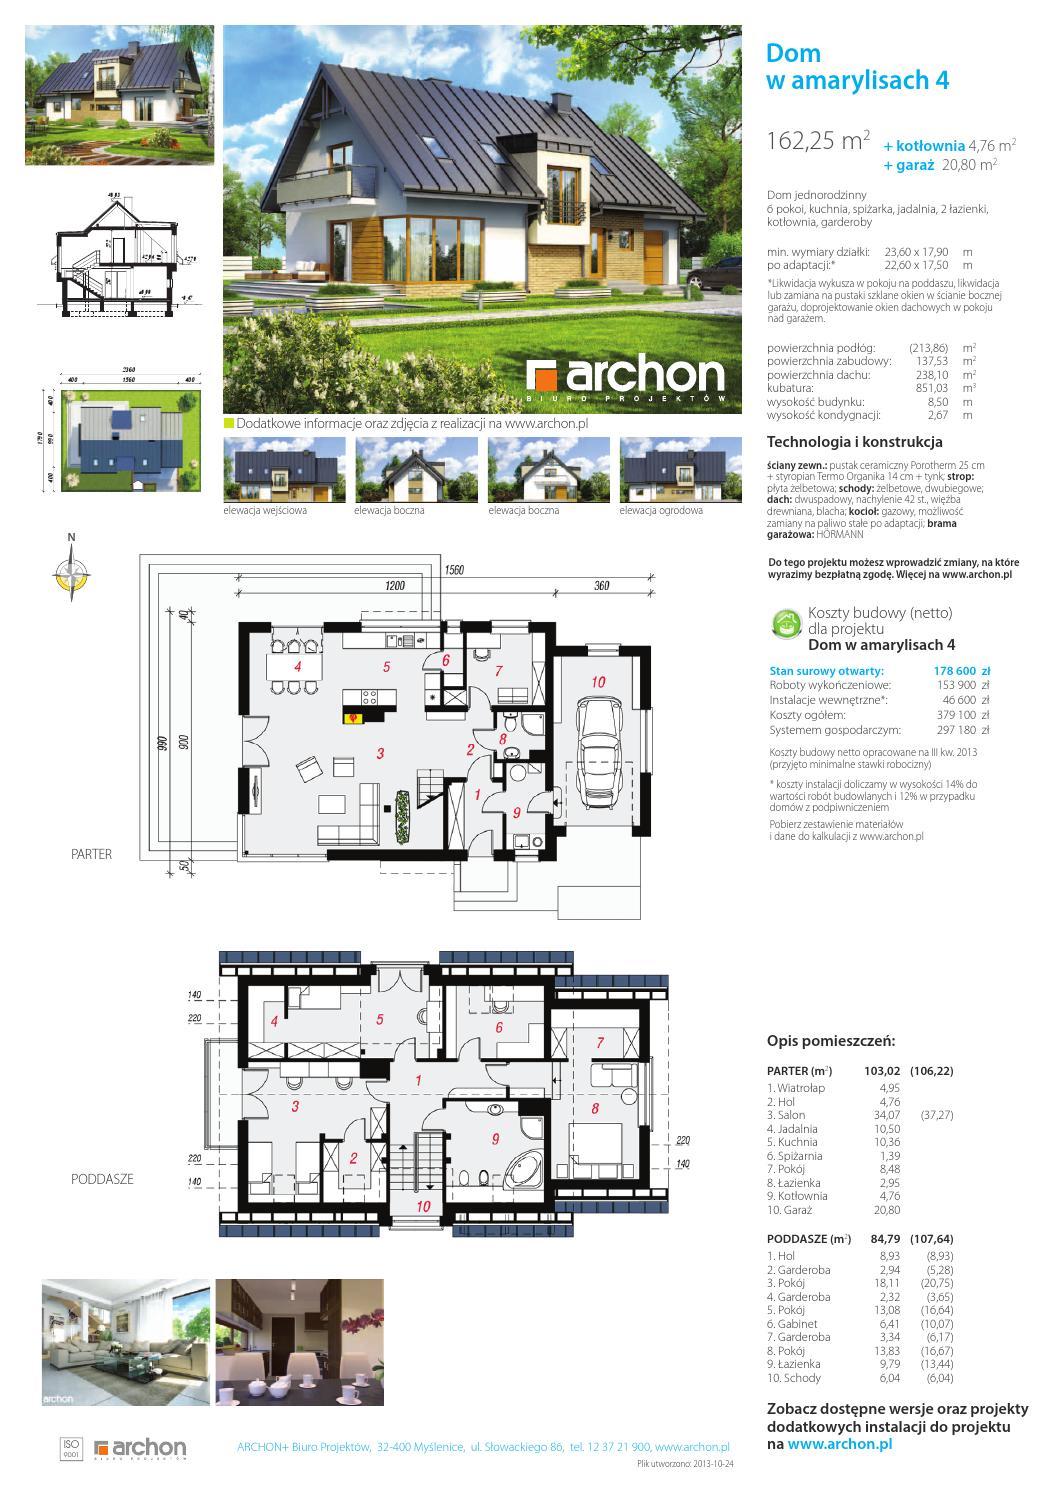 Projekt Domu W Amarylisach 4 By Archon Plus Issuu